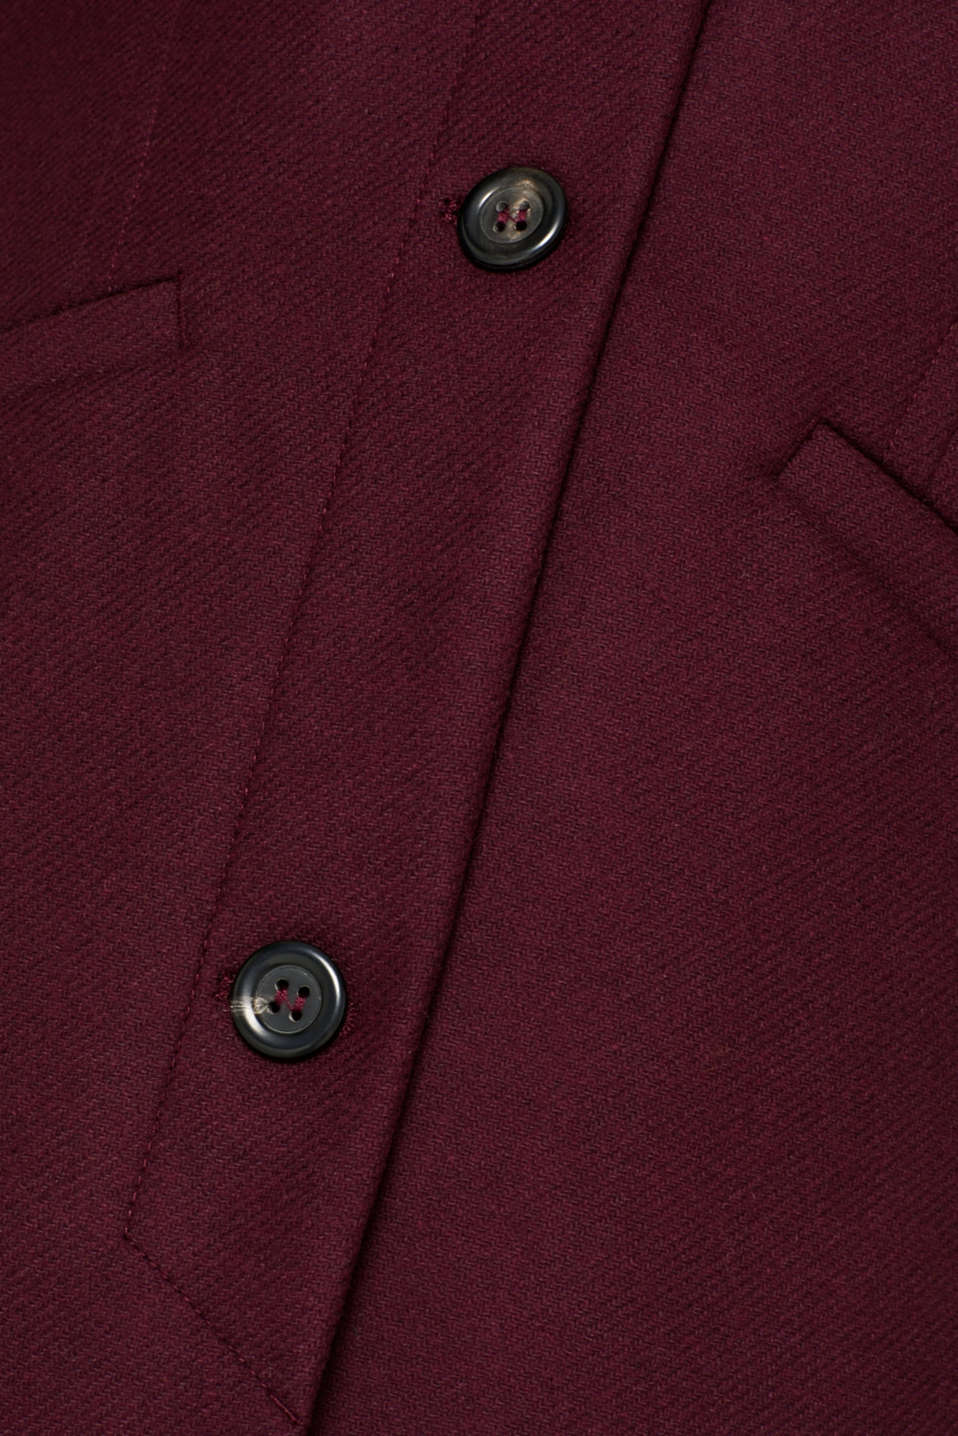 Wool blend coat, BORDEAUX RED, detail image number 4